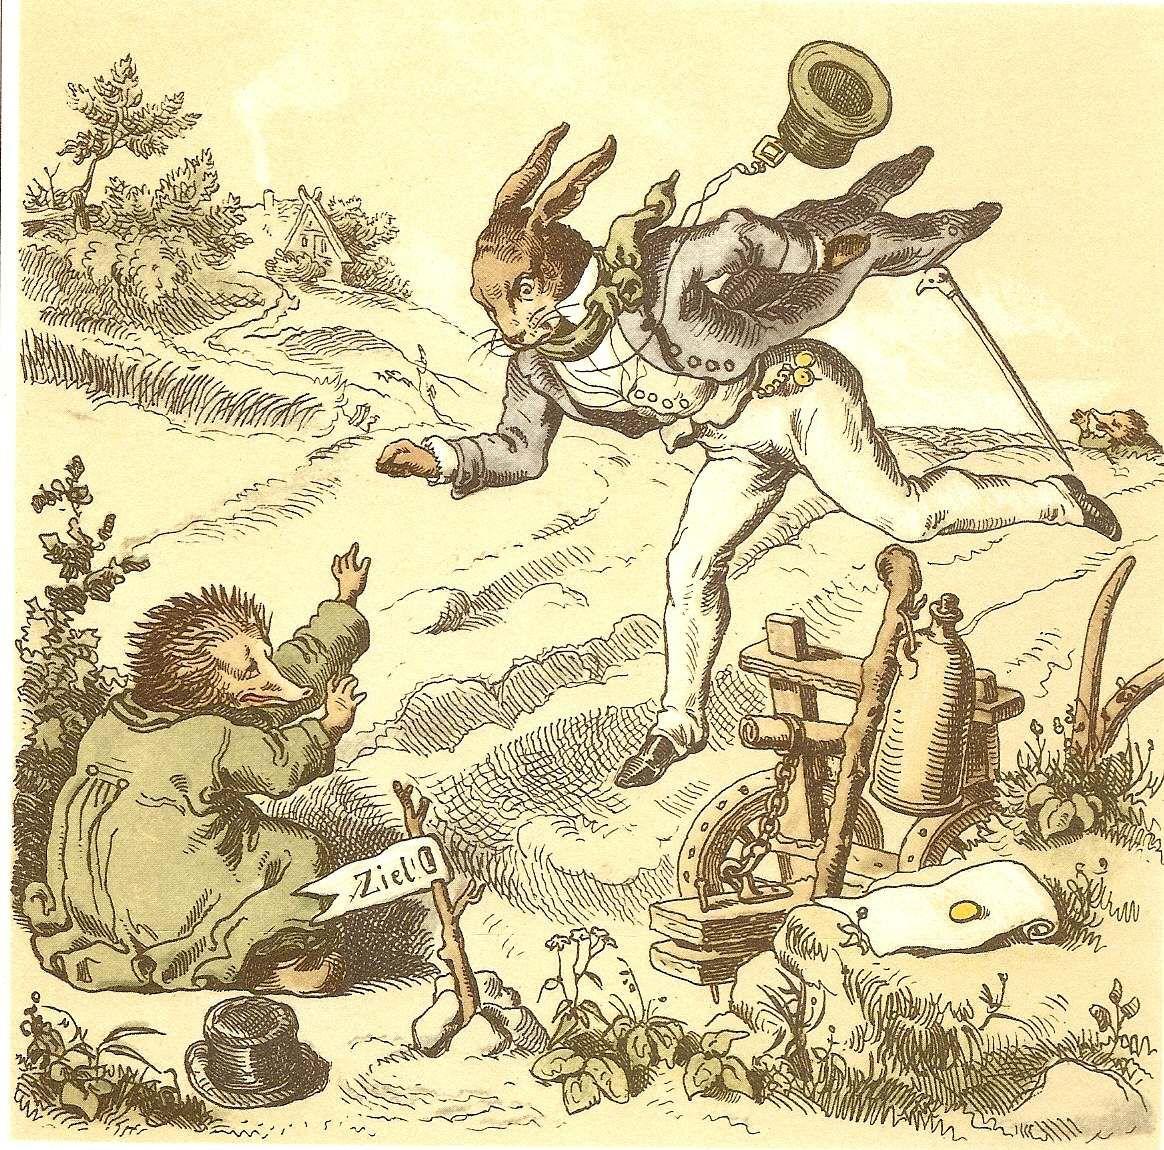 der hase und der igel'  'the hare and the hedgehog'